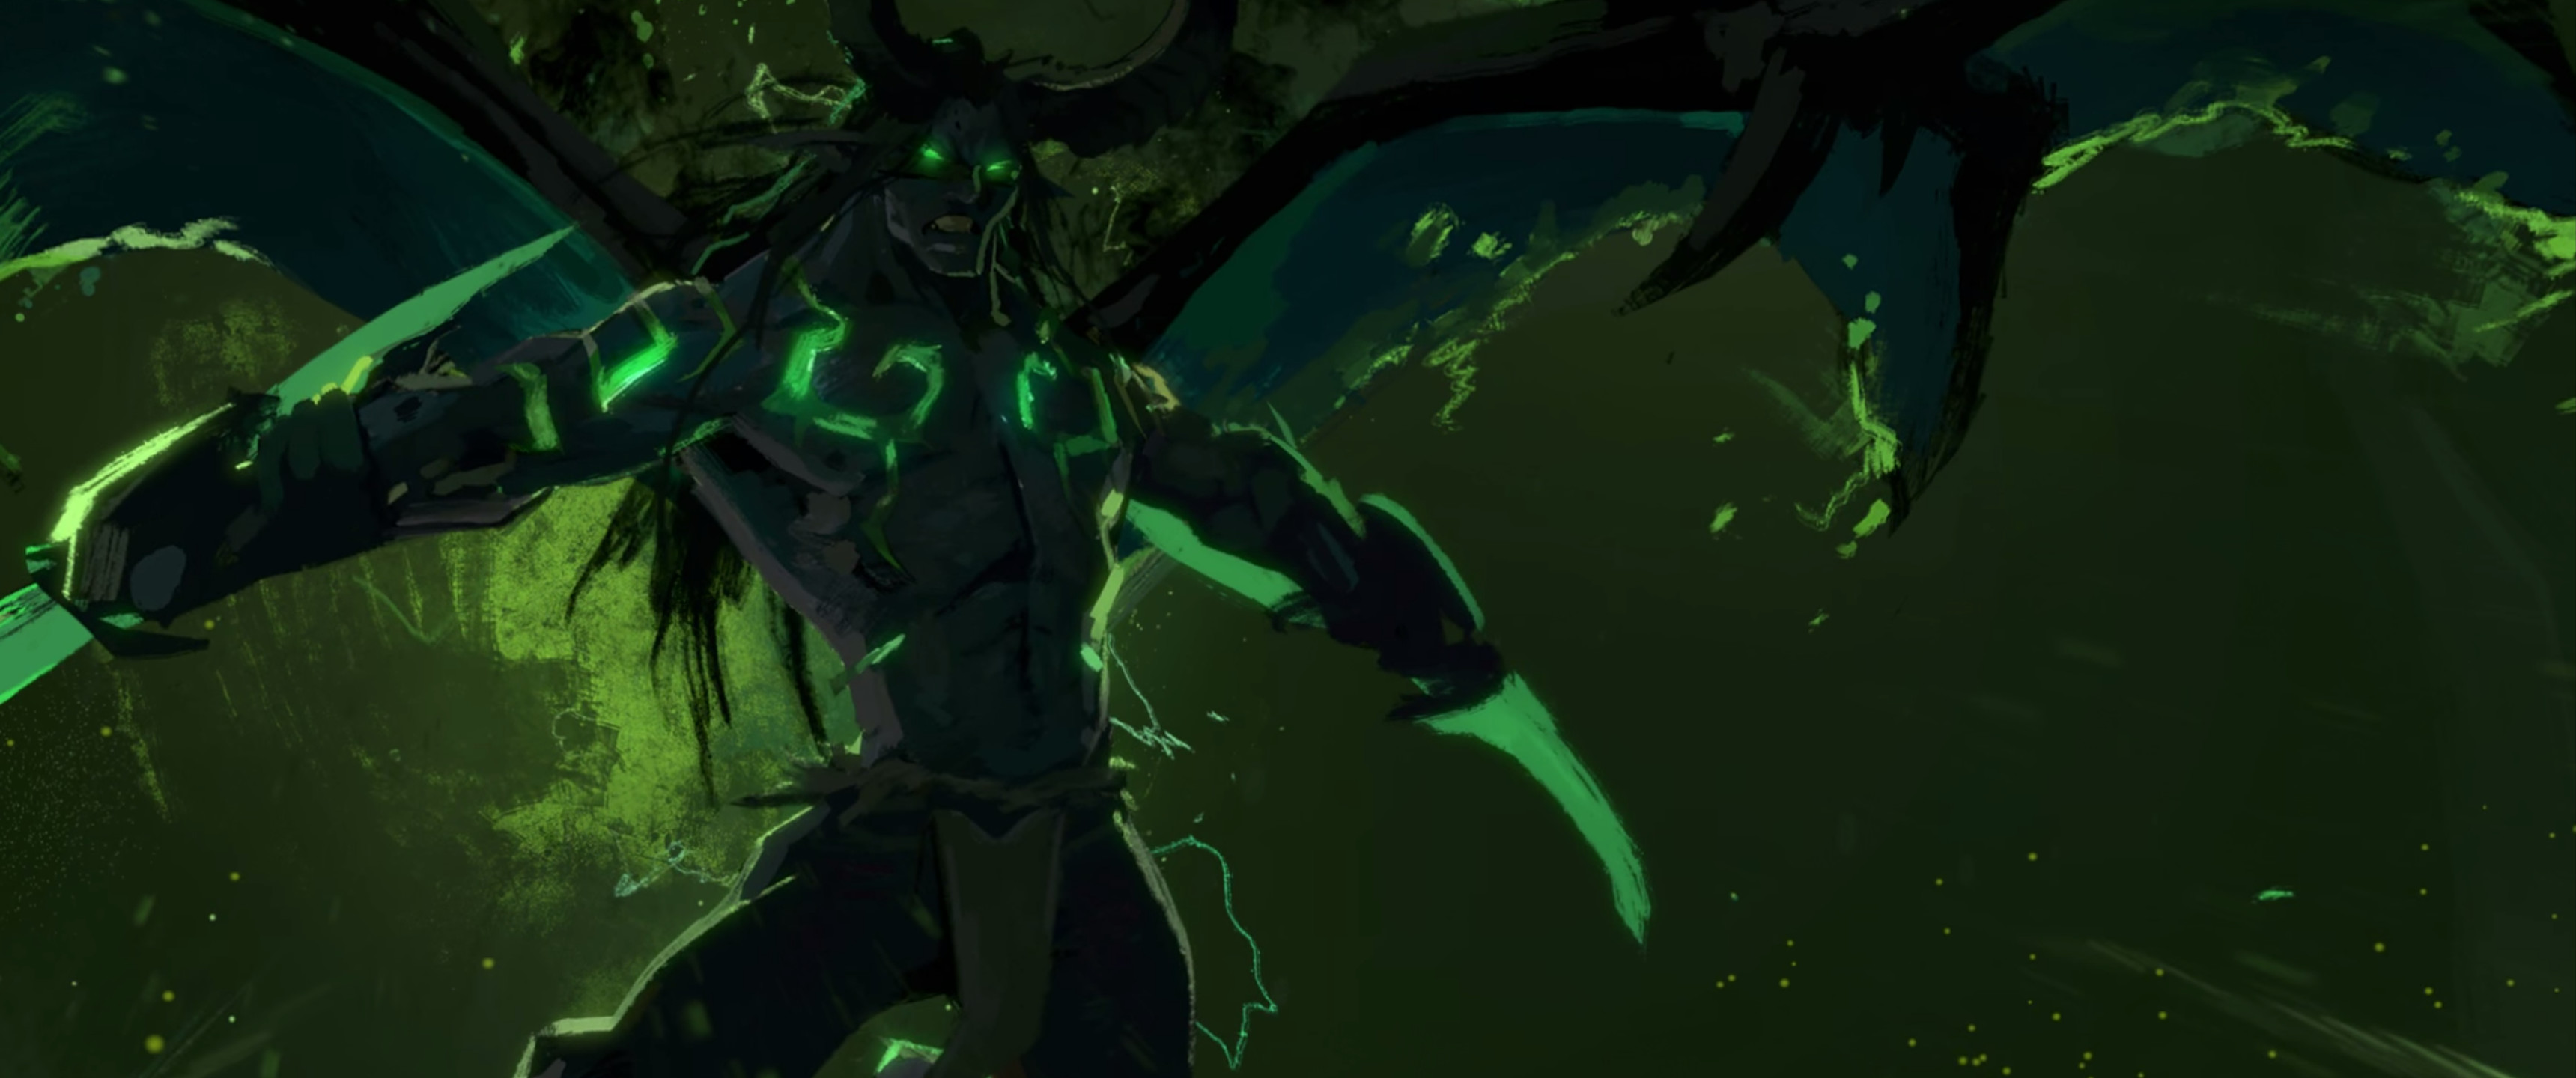 General World of Warcraft Blizzard Entertainment Demon Hunter  Illidan Stormrage